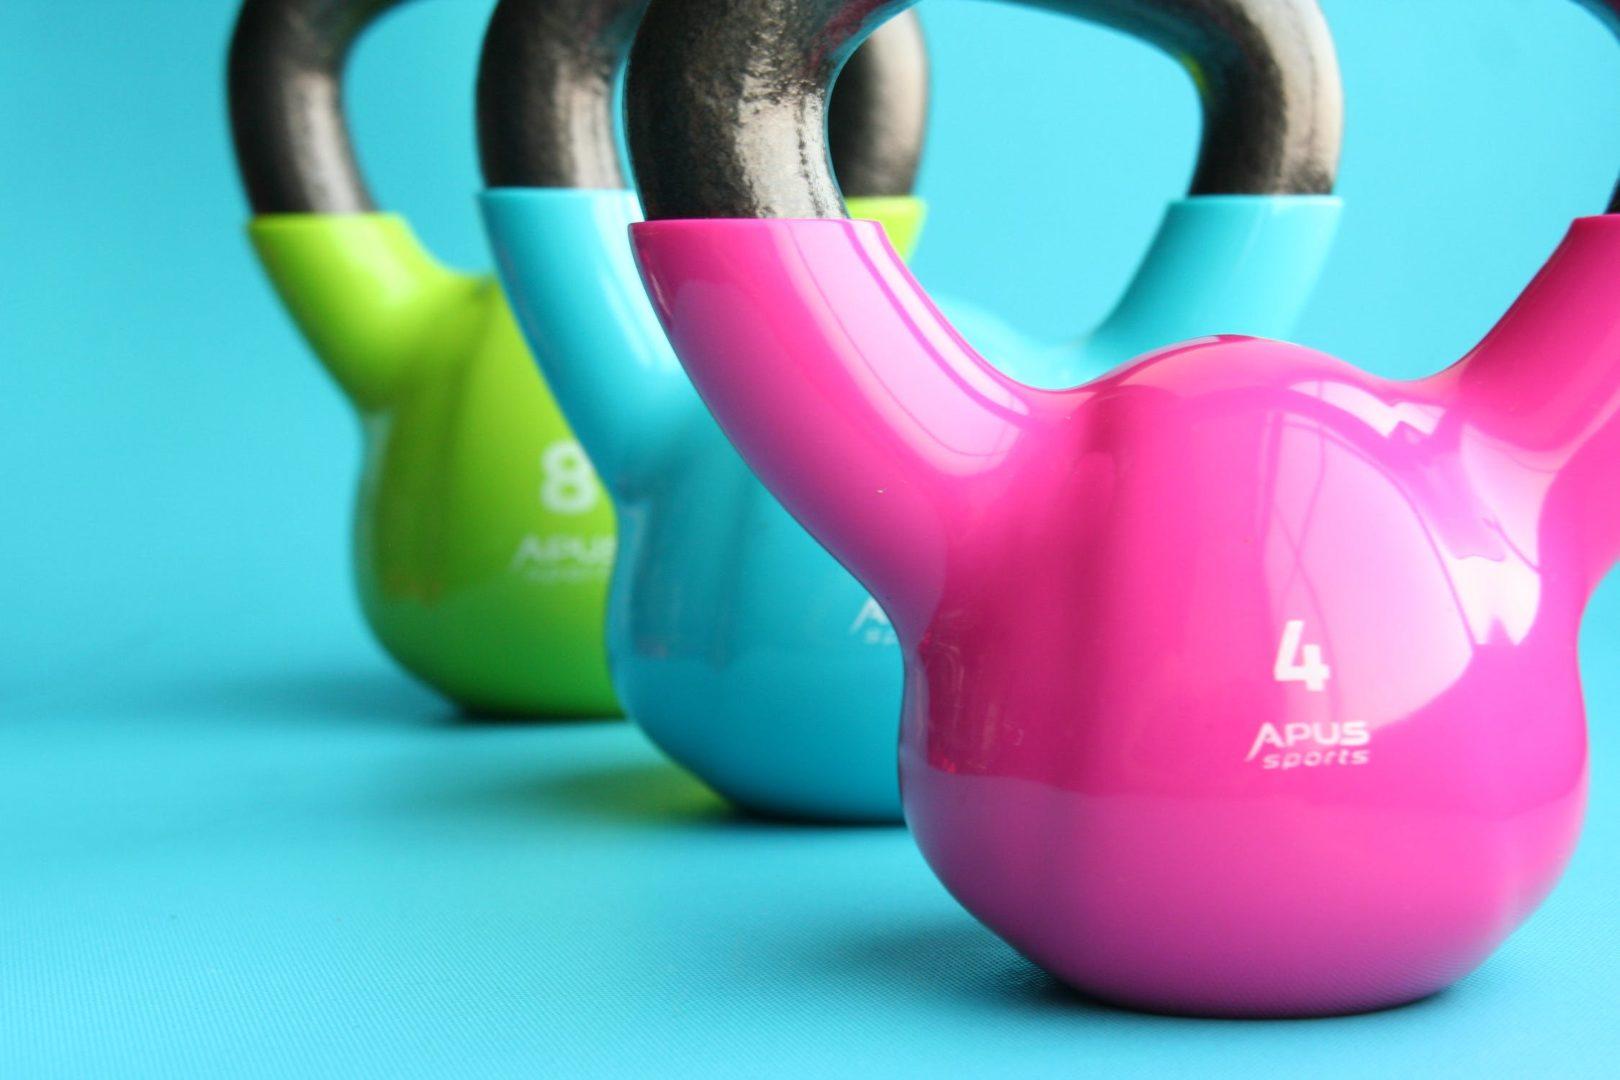 Assorted kettle ball weights